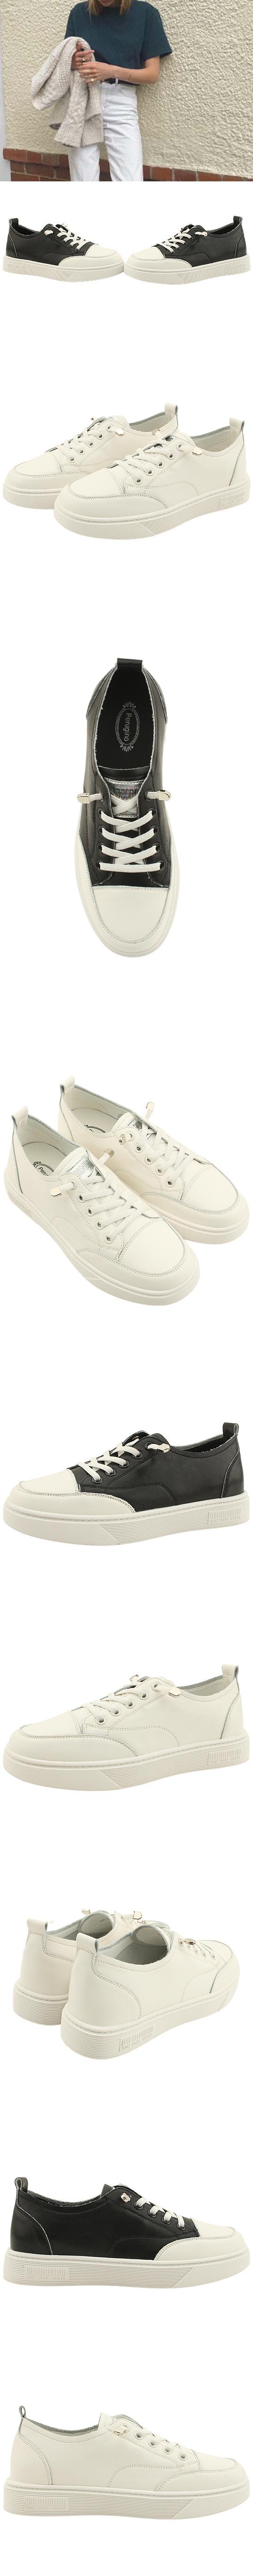 Cowhide Simple Banding Strap Sneakers White